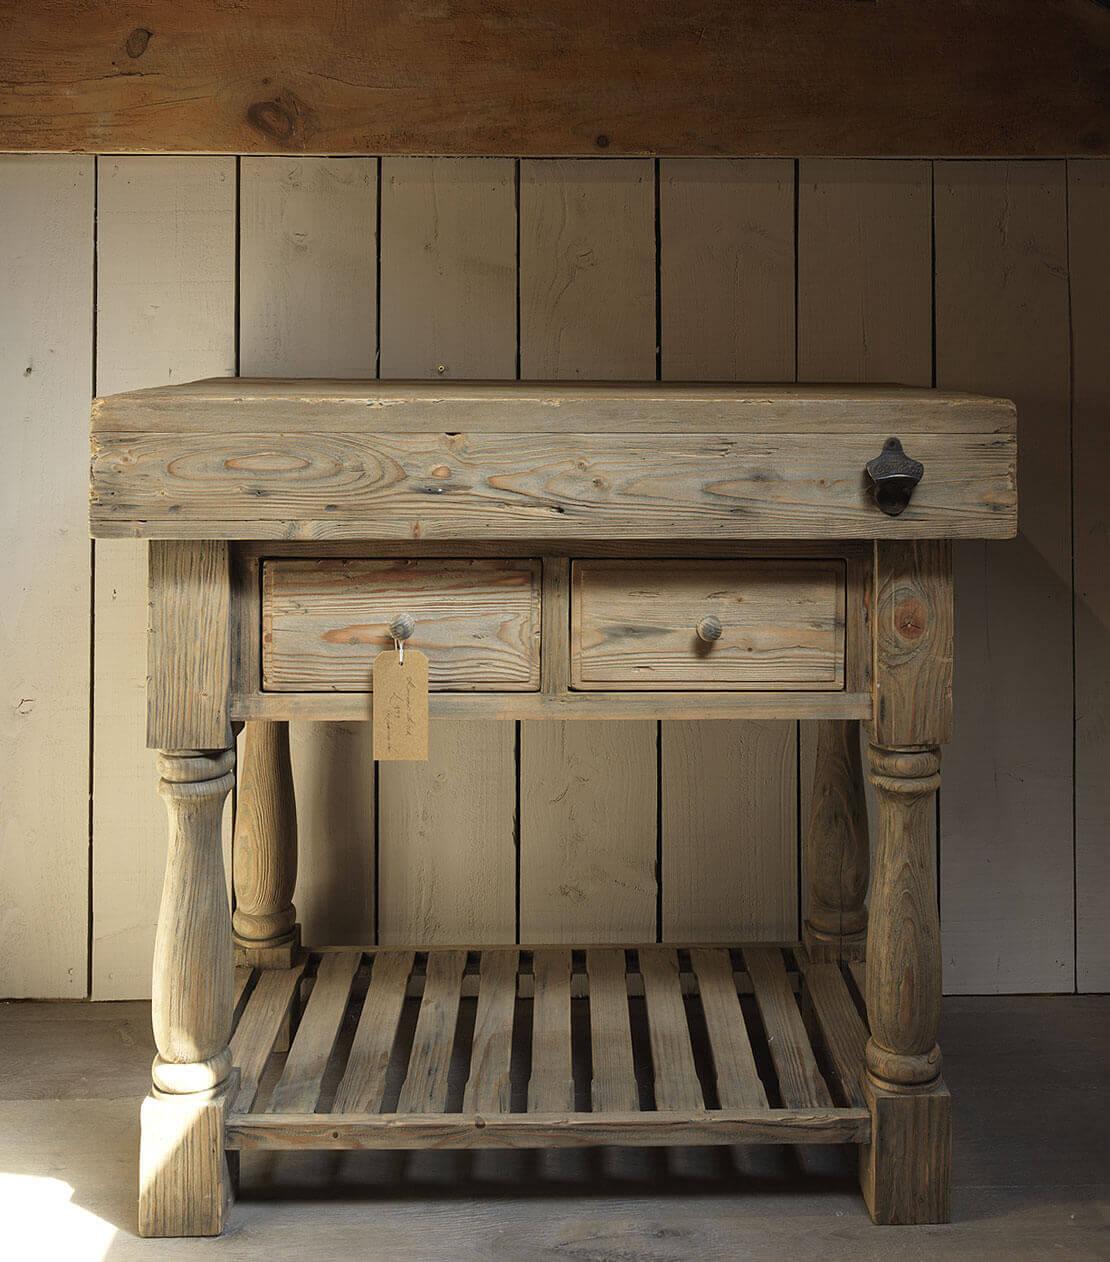 Lifestyle Furniture Company: Home & Lifestyle Furniture